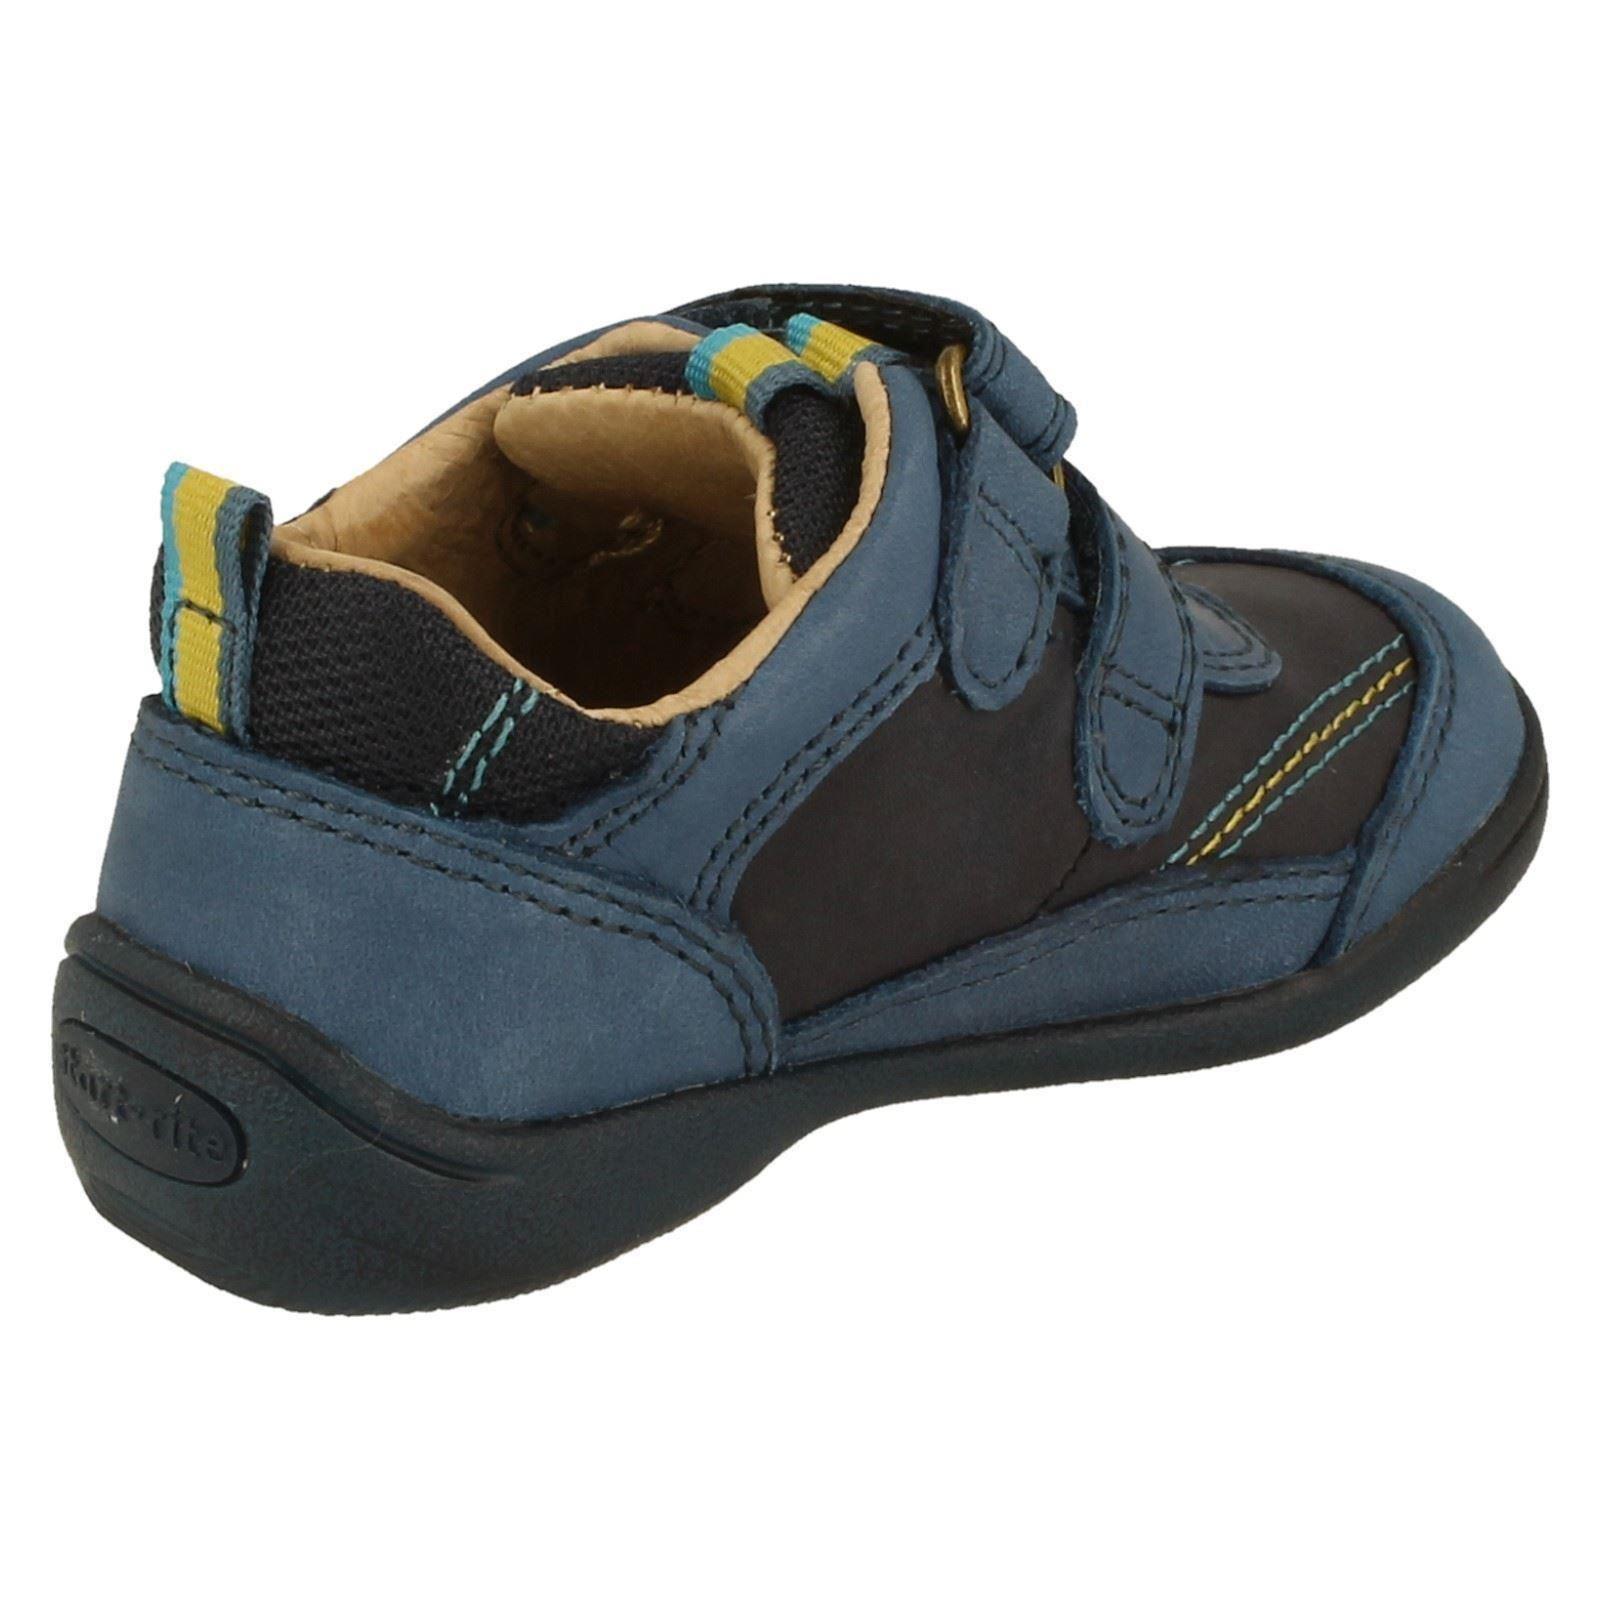 Chicos START Rite Informal Zapatos Estilo SRSS Leo-W